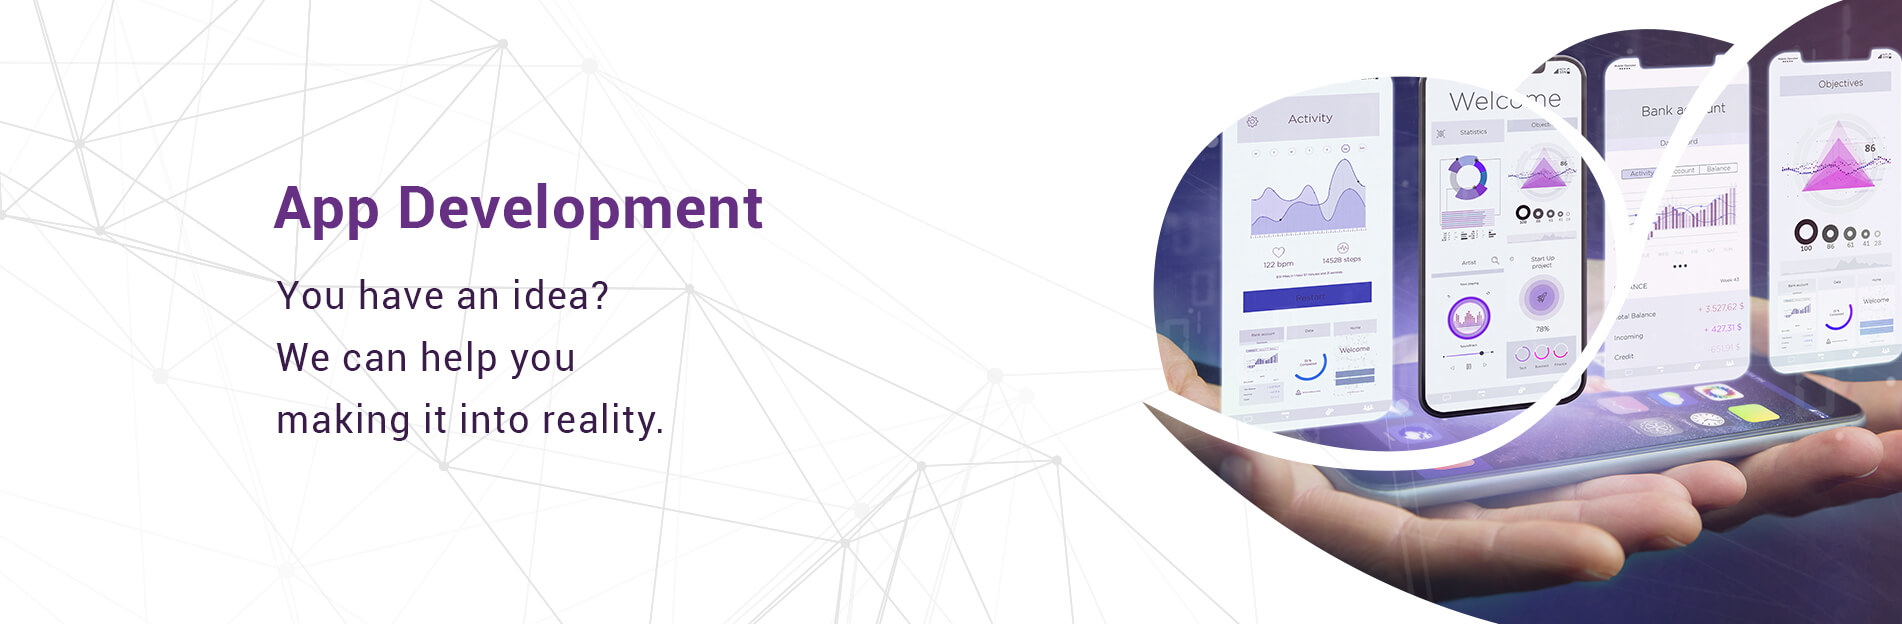 app-development-new